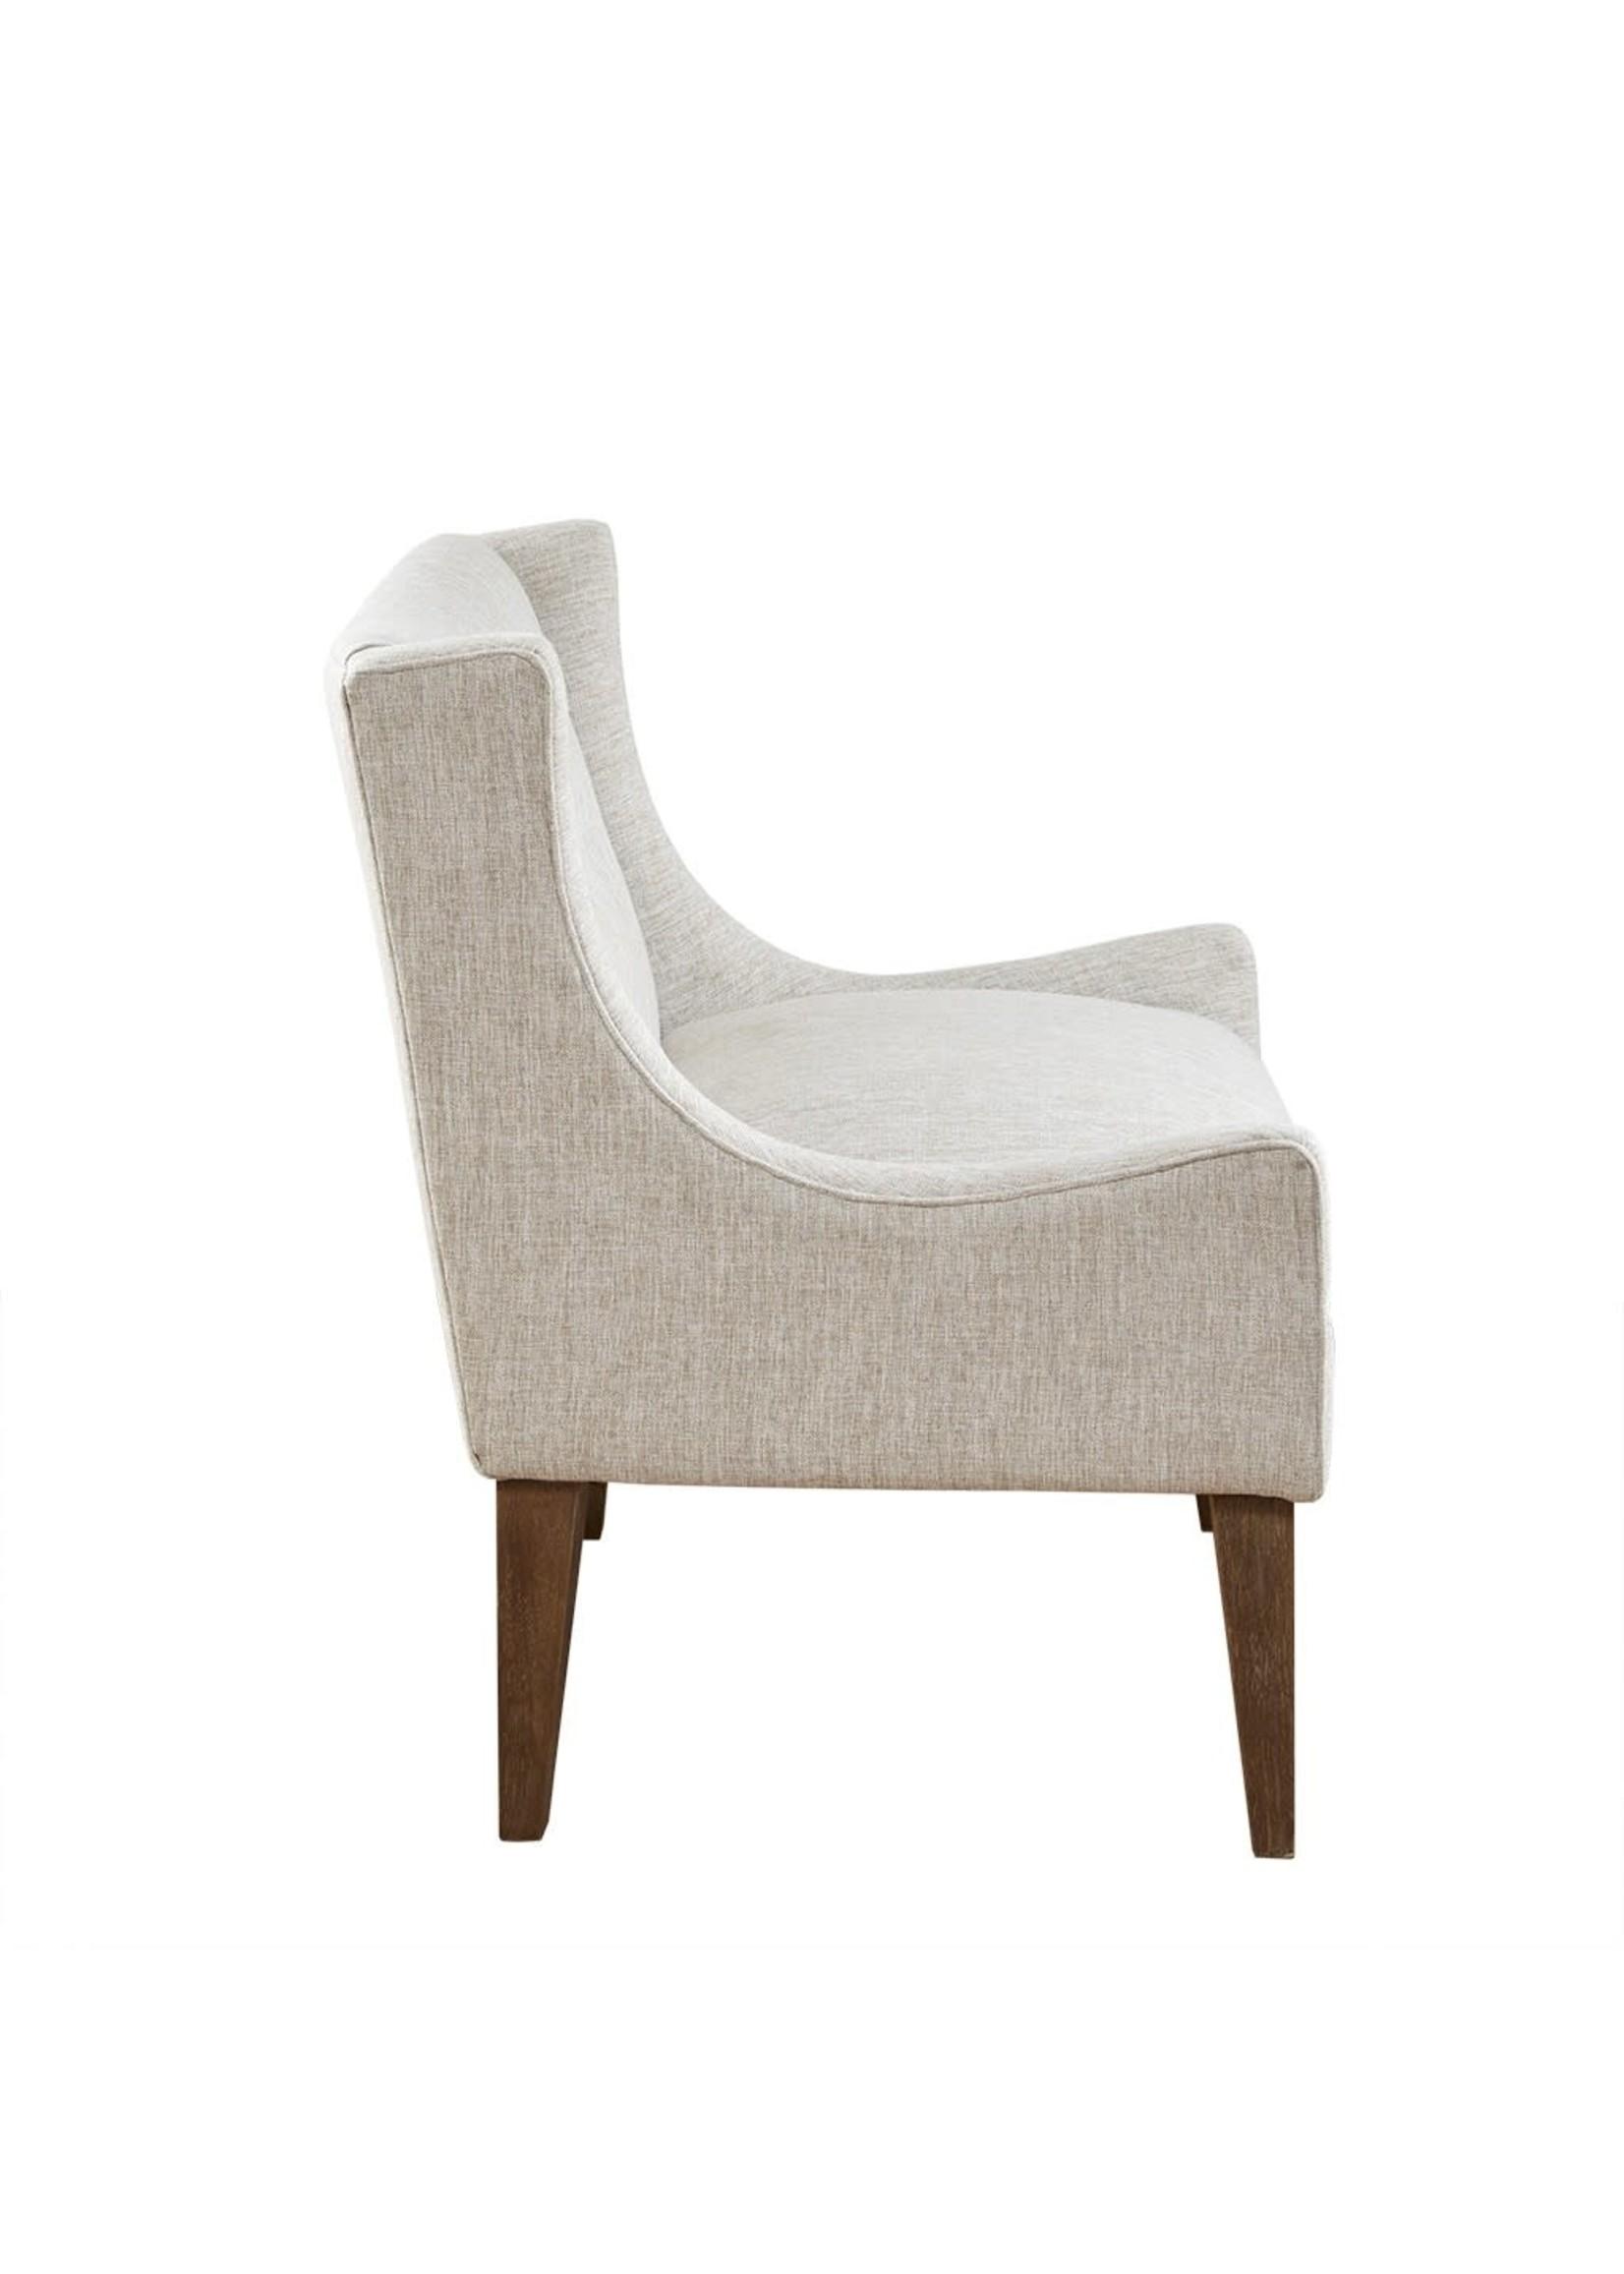 Olliix Malabar Accent Chair Cream